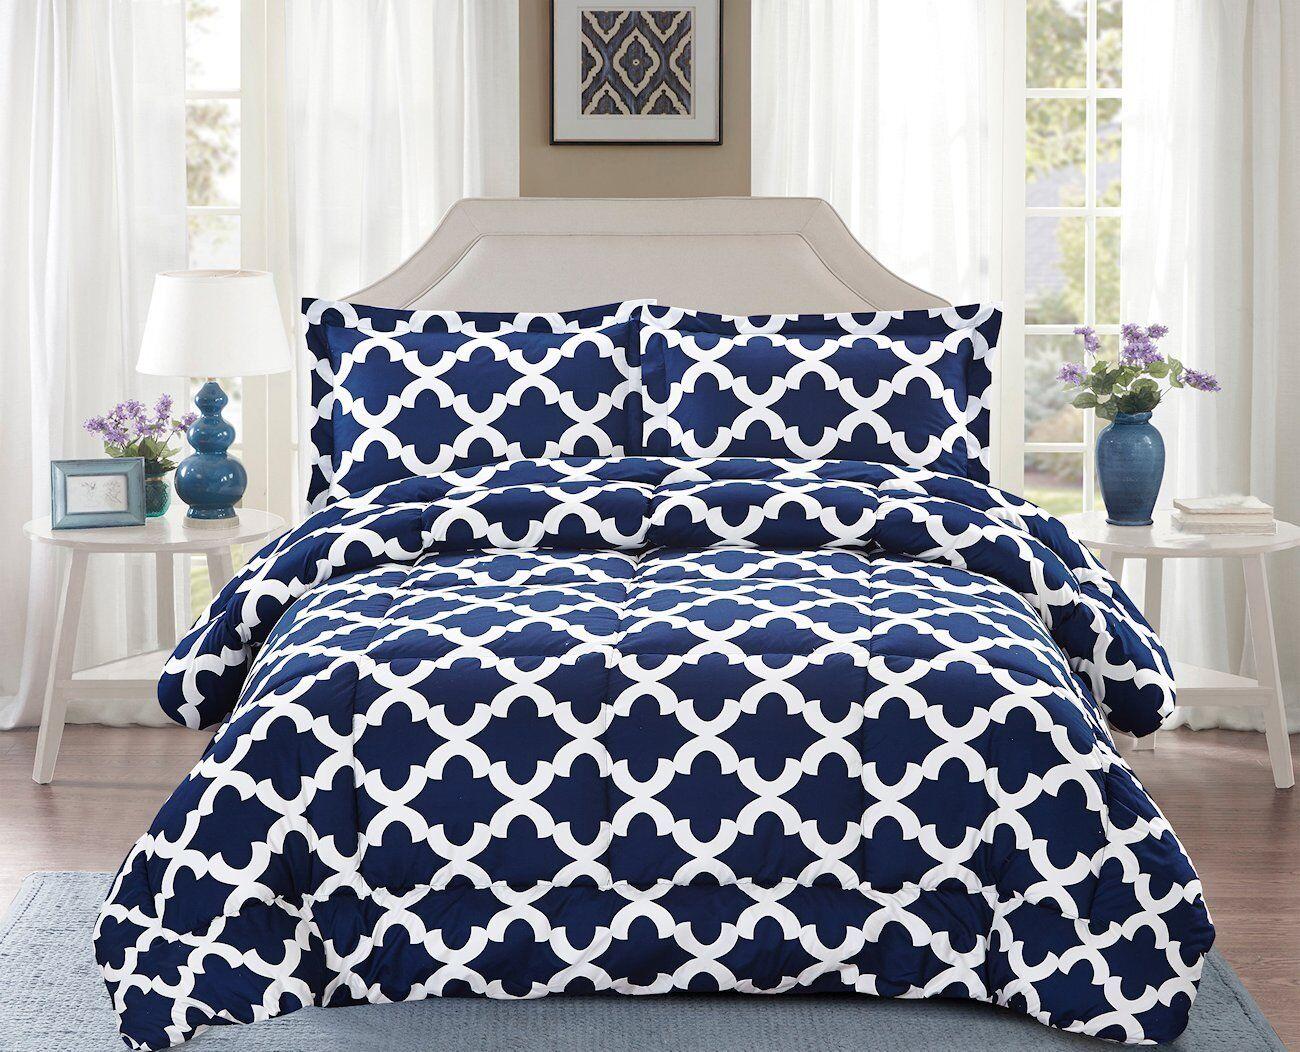 Navy Blue Ultra Soft Microfiber Comforter w/ Pillow Shams Go